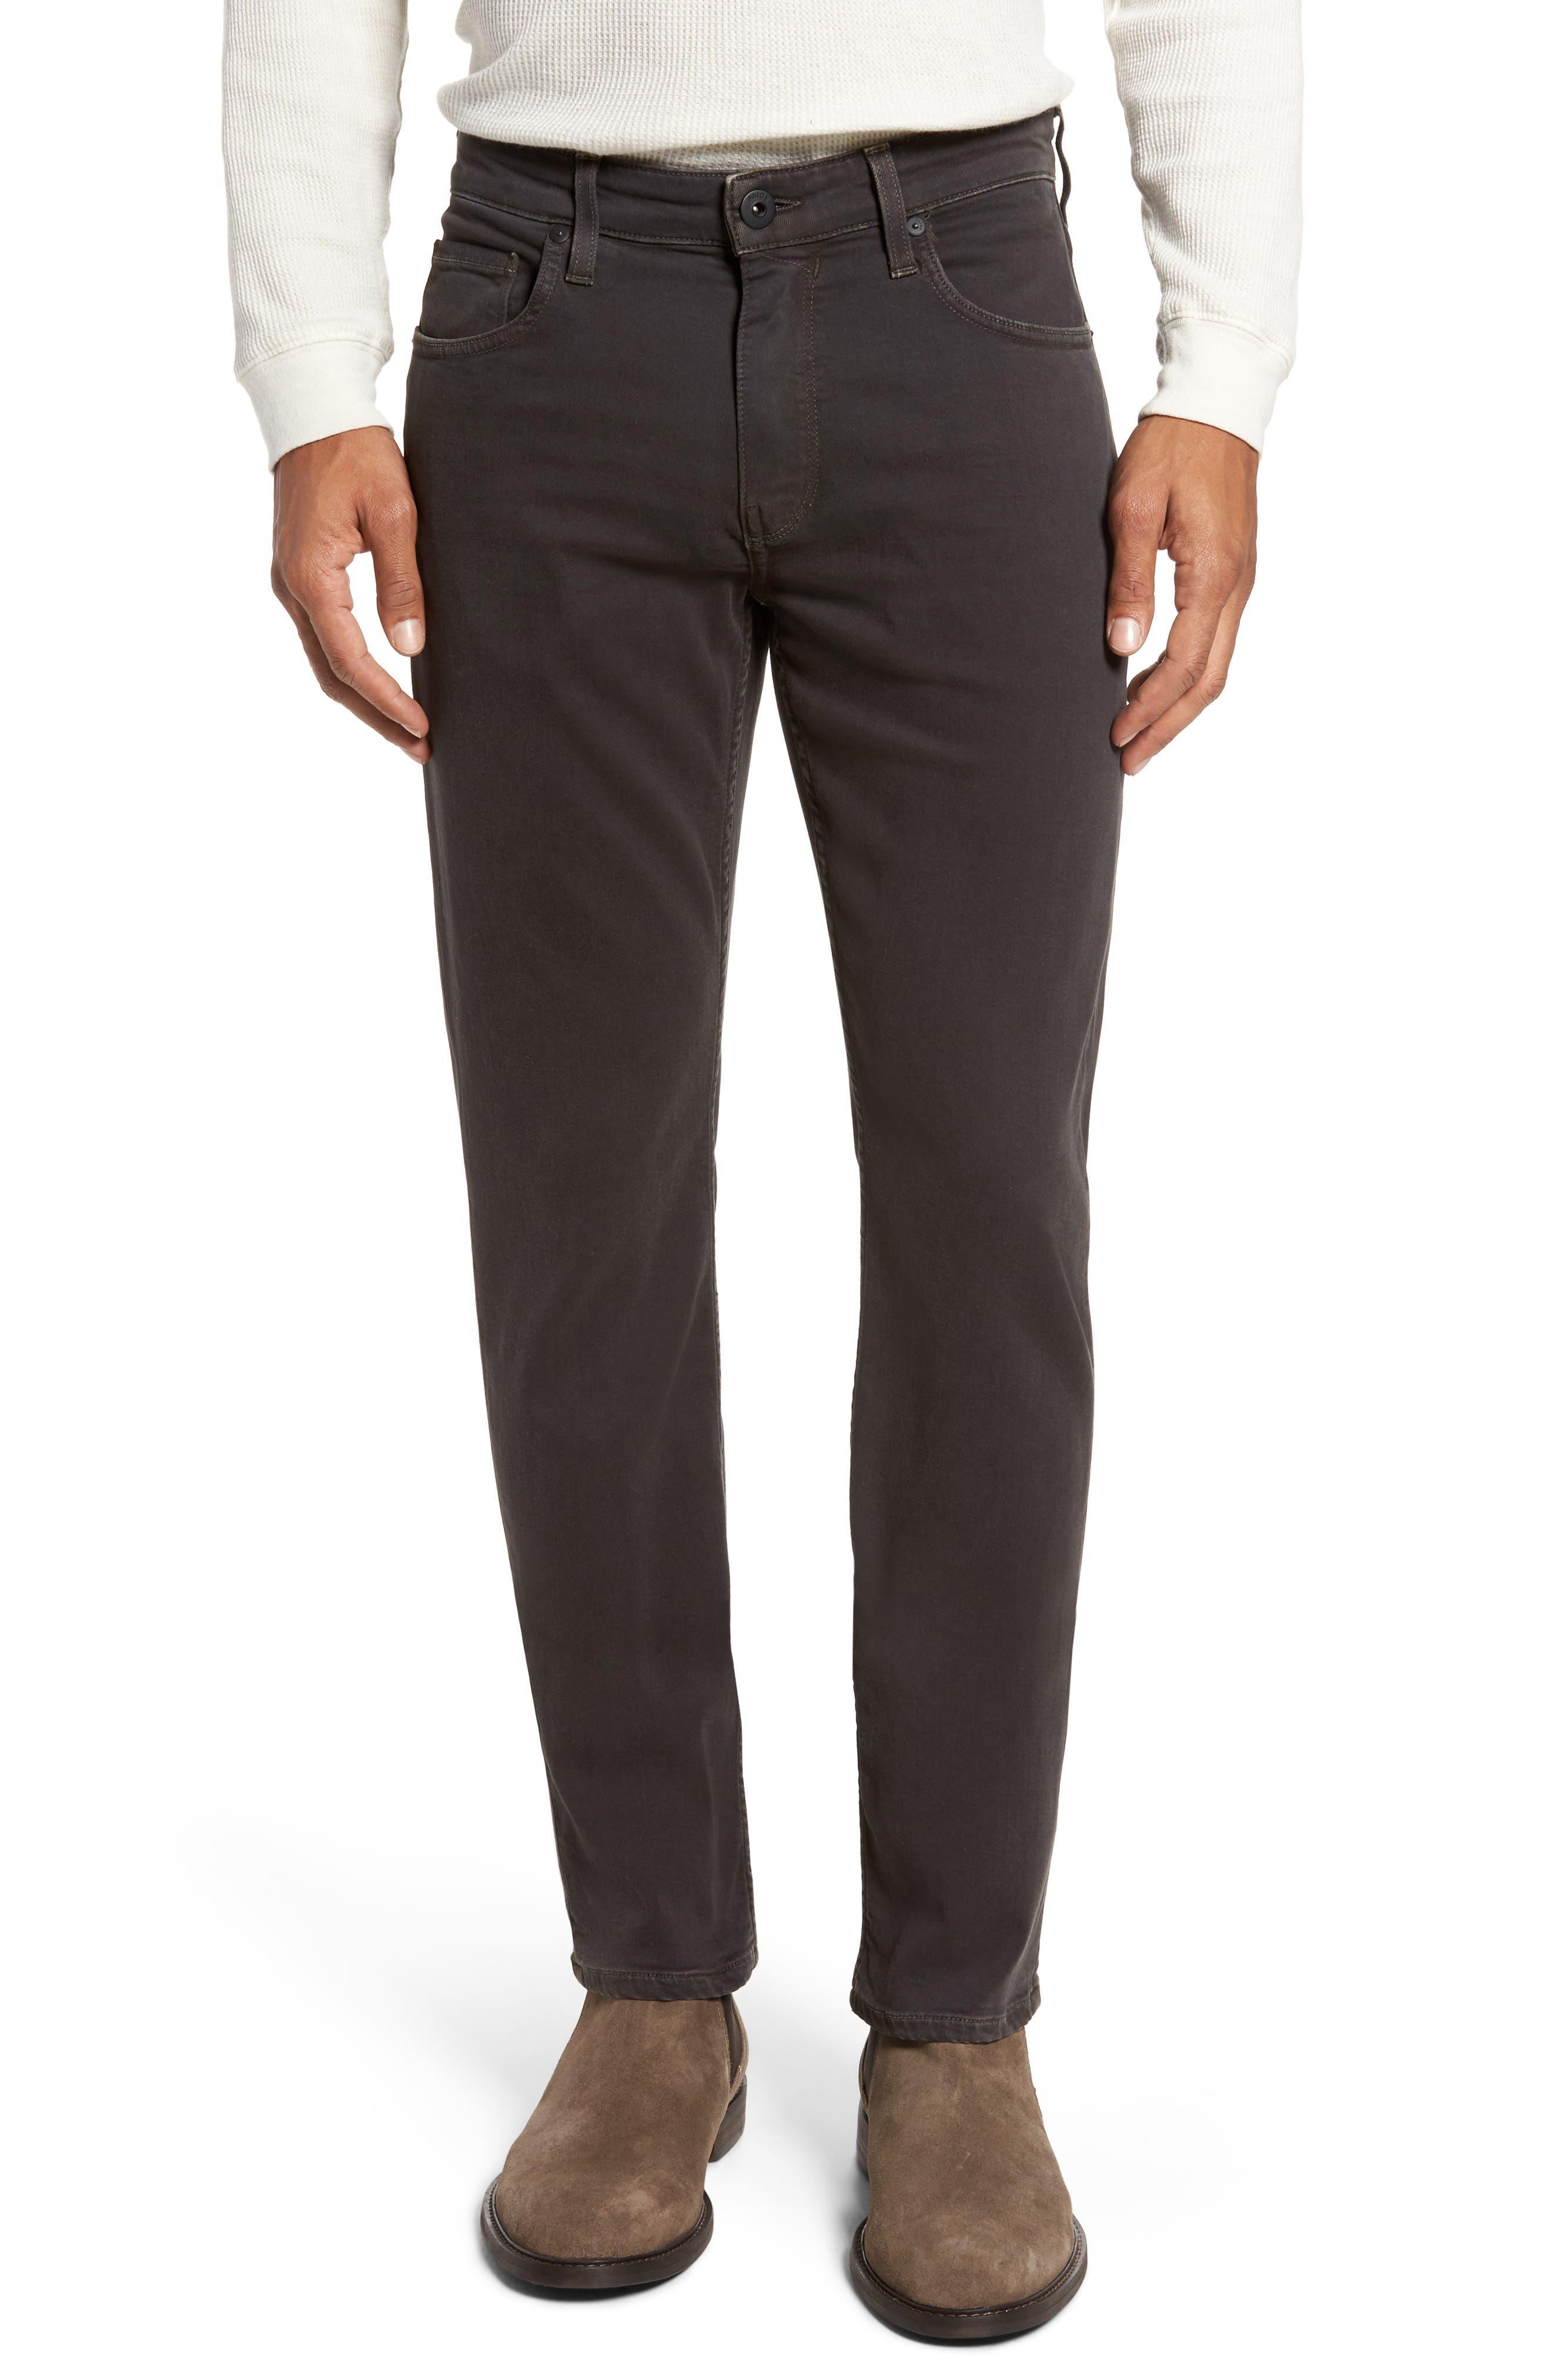 Alternate Image 1 Selected - PAIGE Transcend - Federal Slim Straight Leg Jeans (Vintage Black Fade)